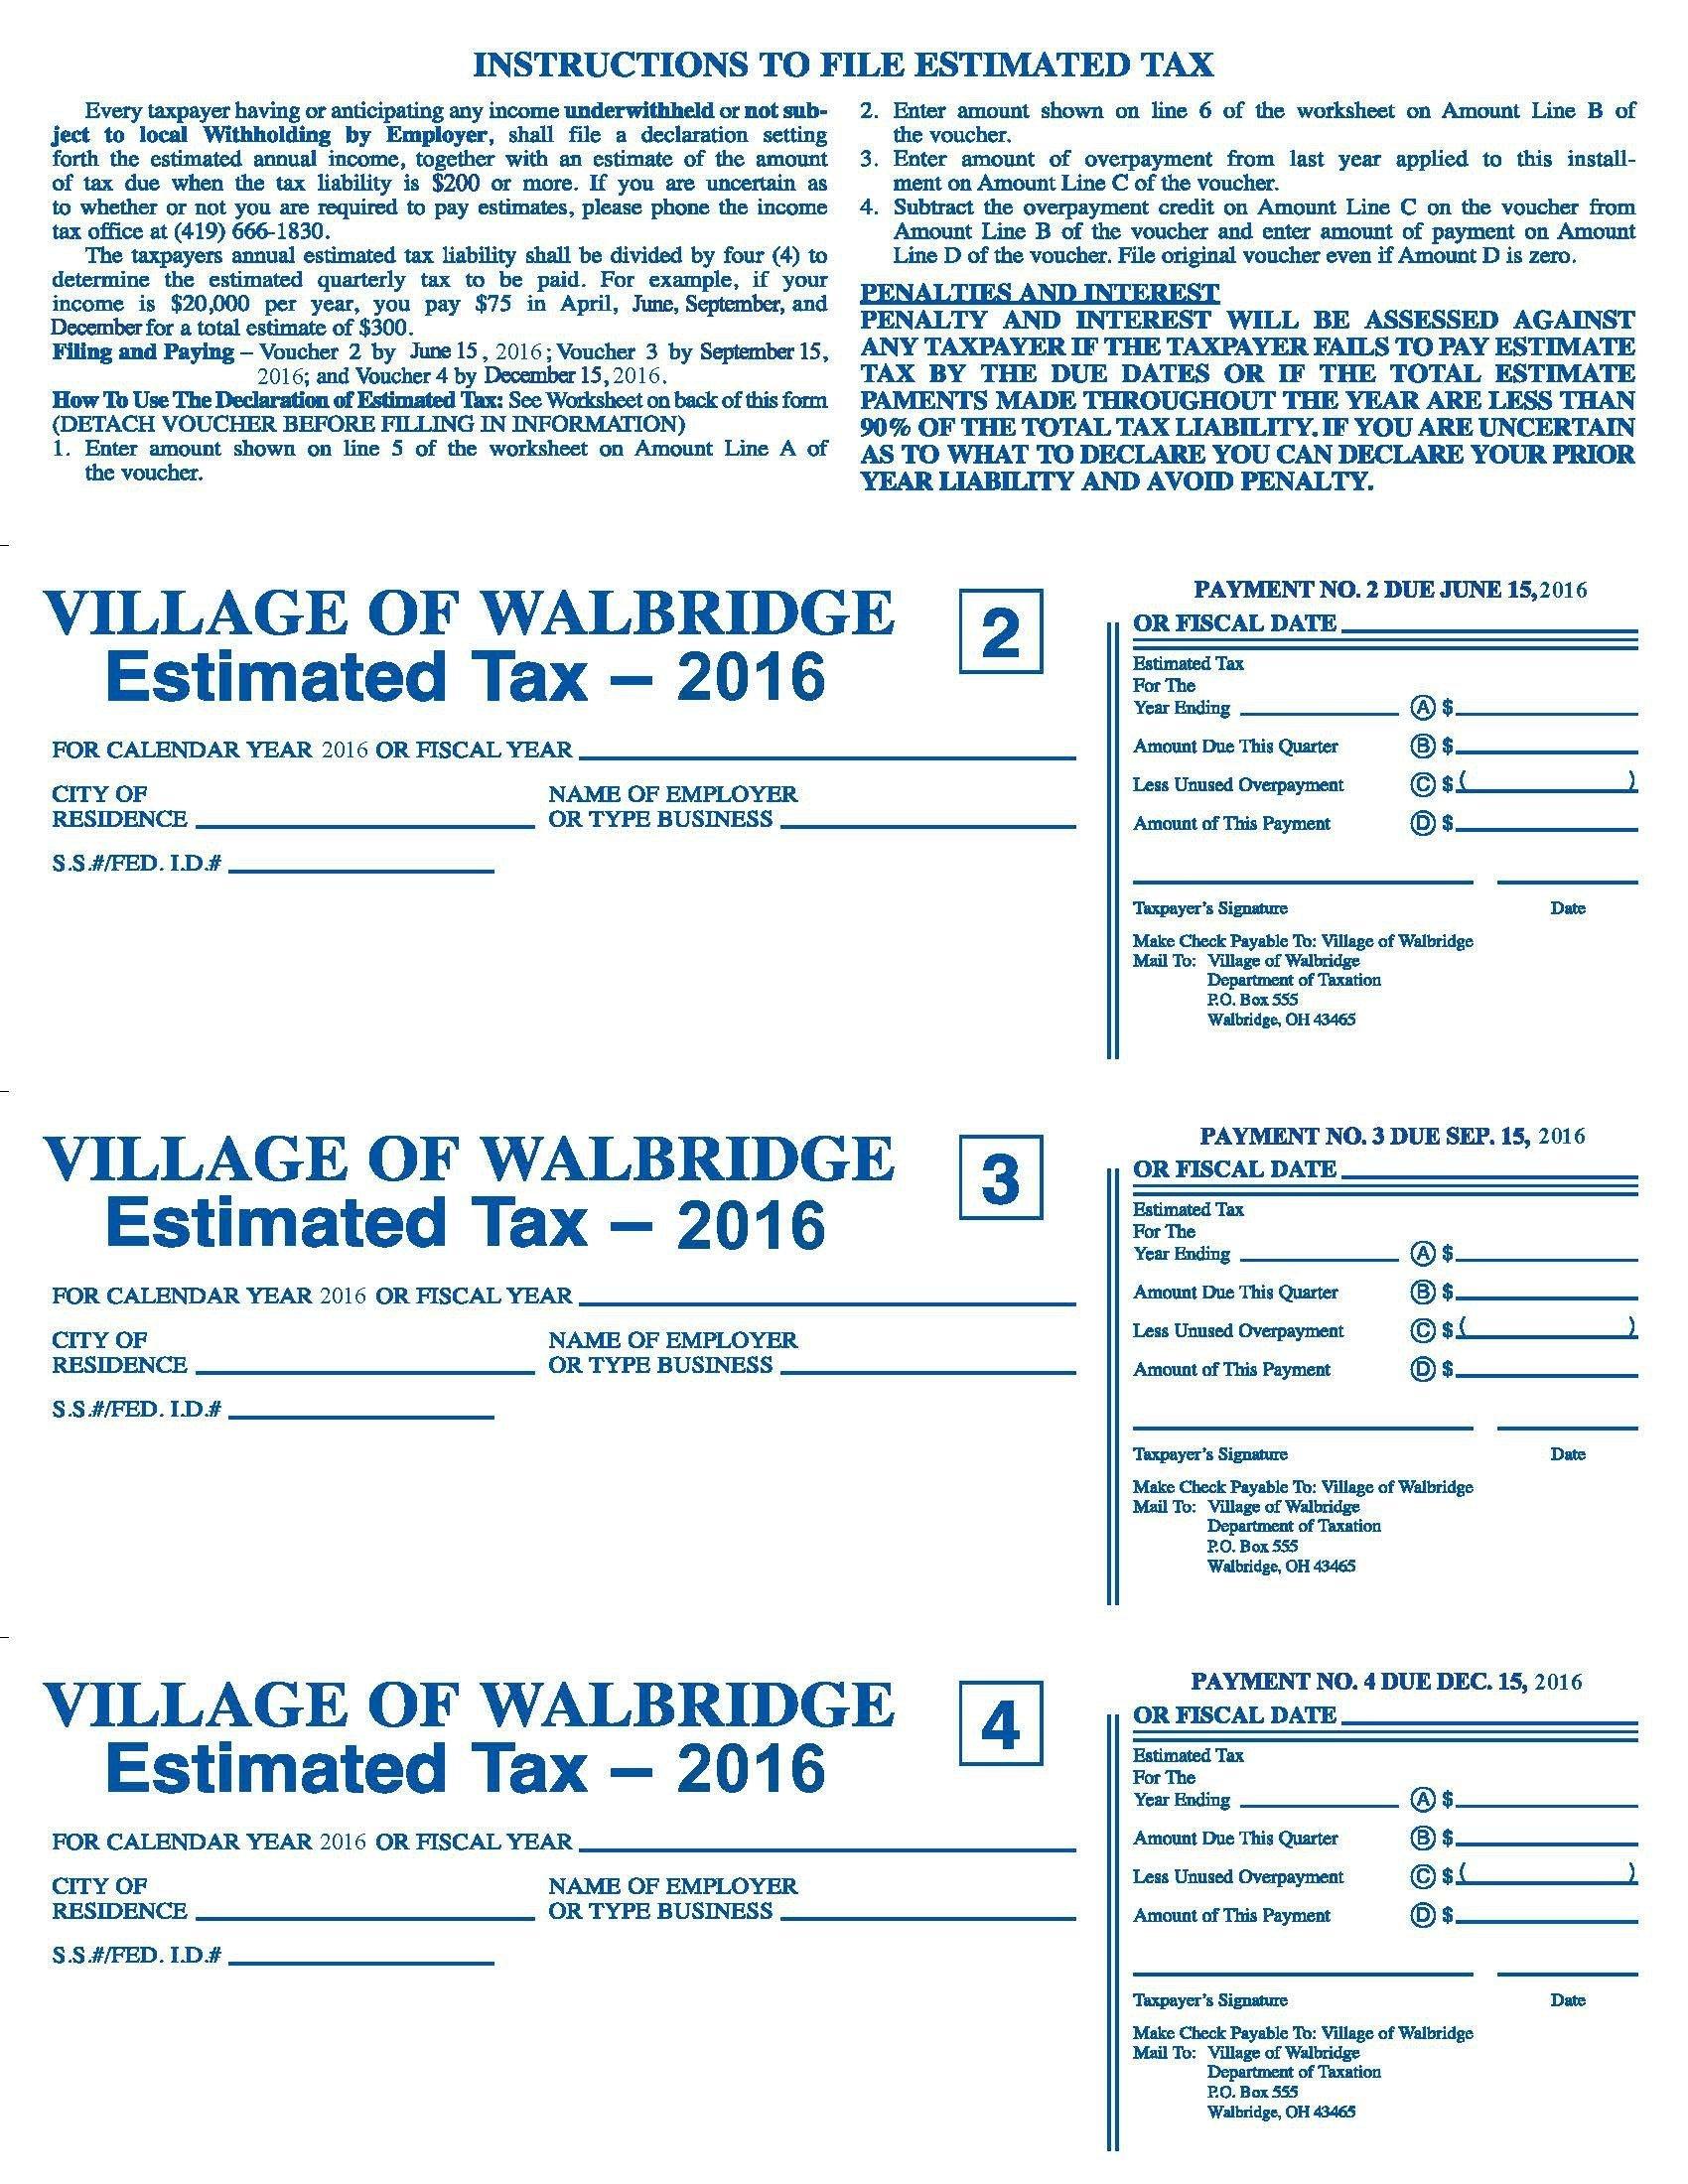 2015 Estimated Tax Forms Village of Walbridge